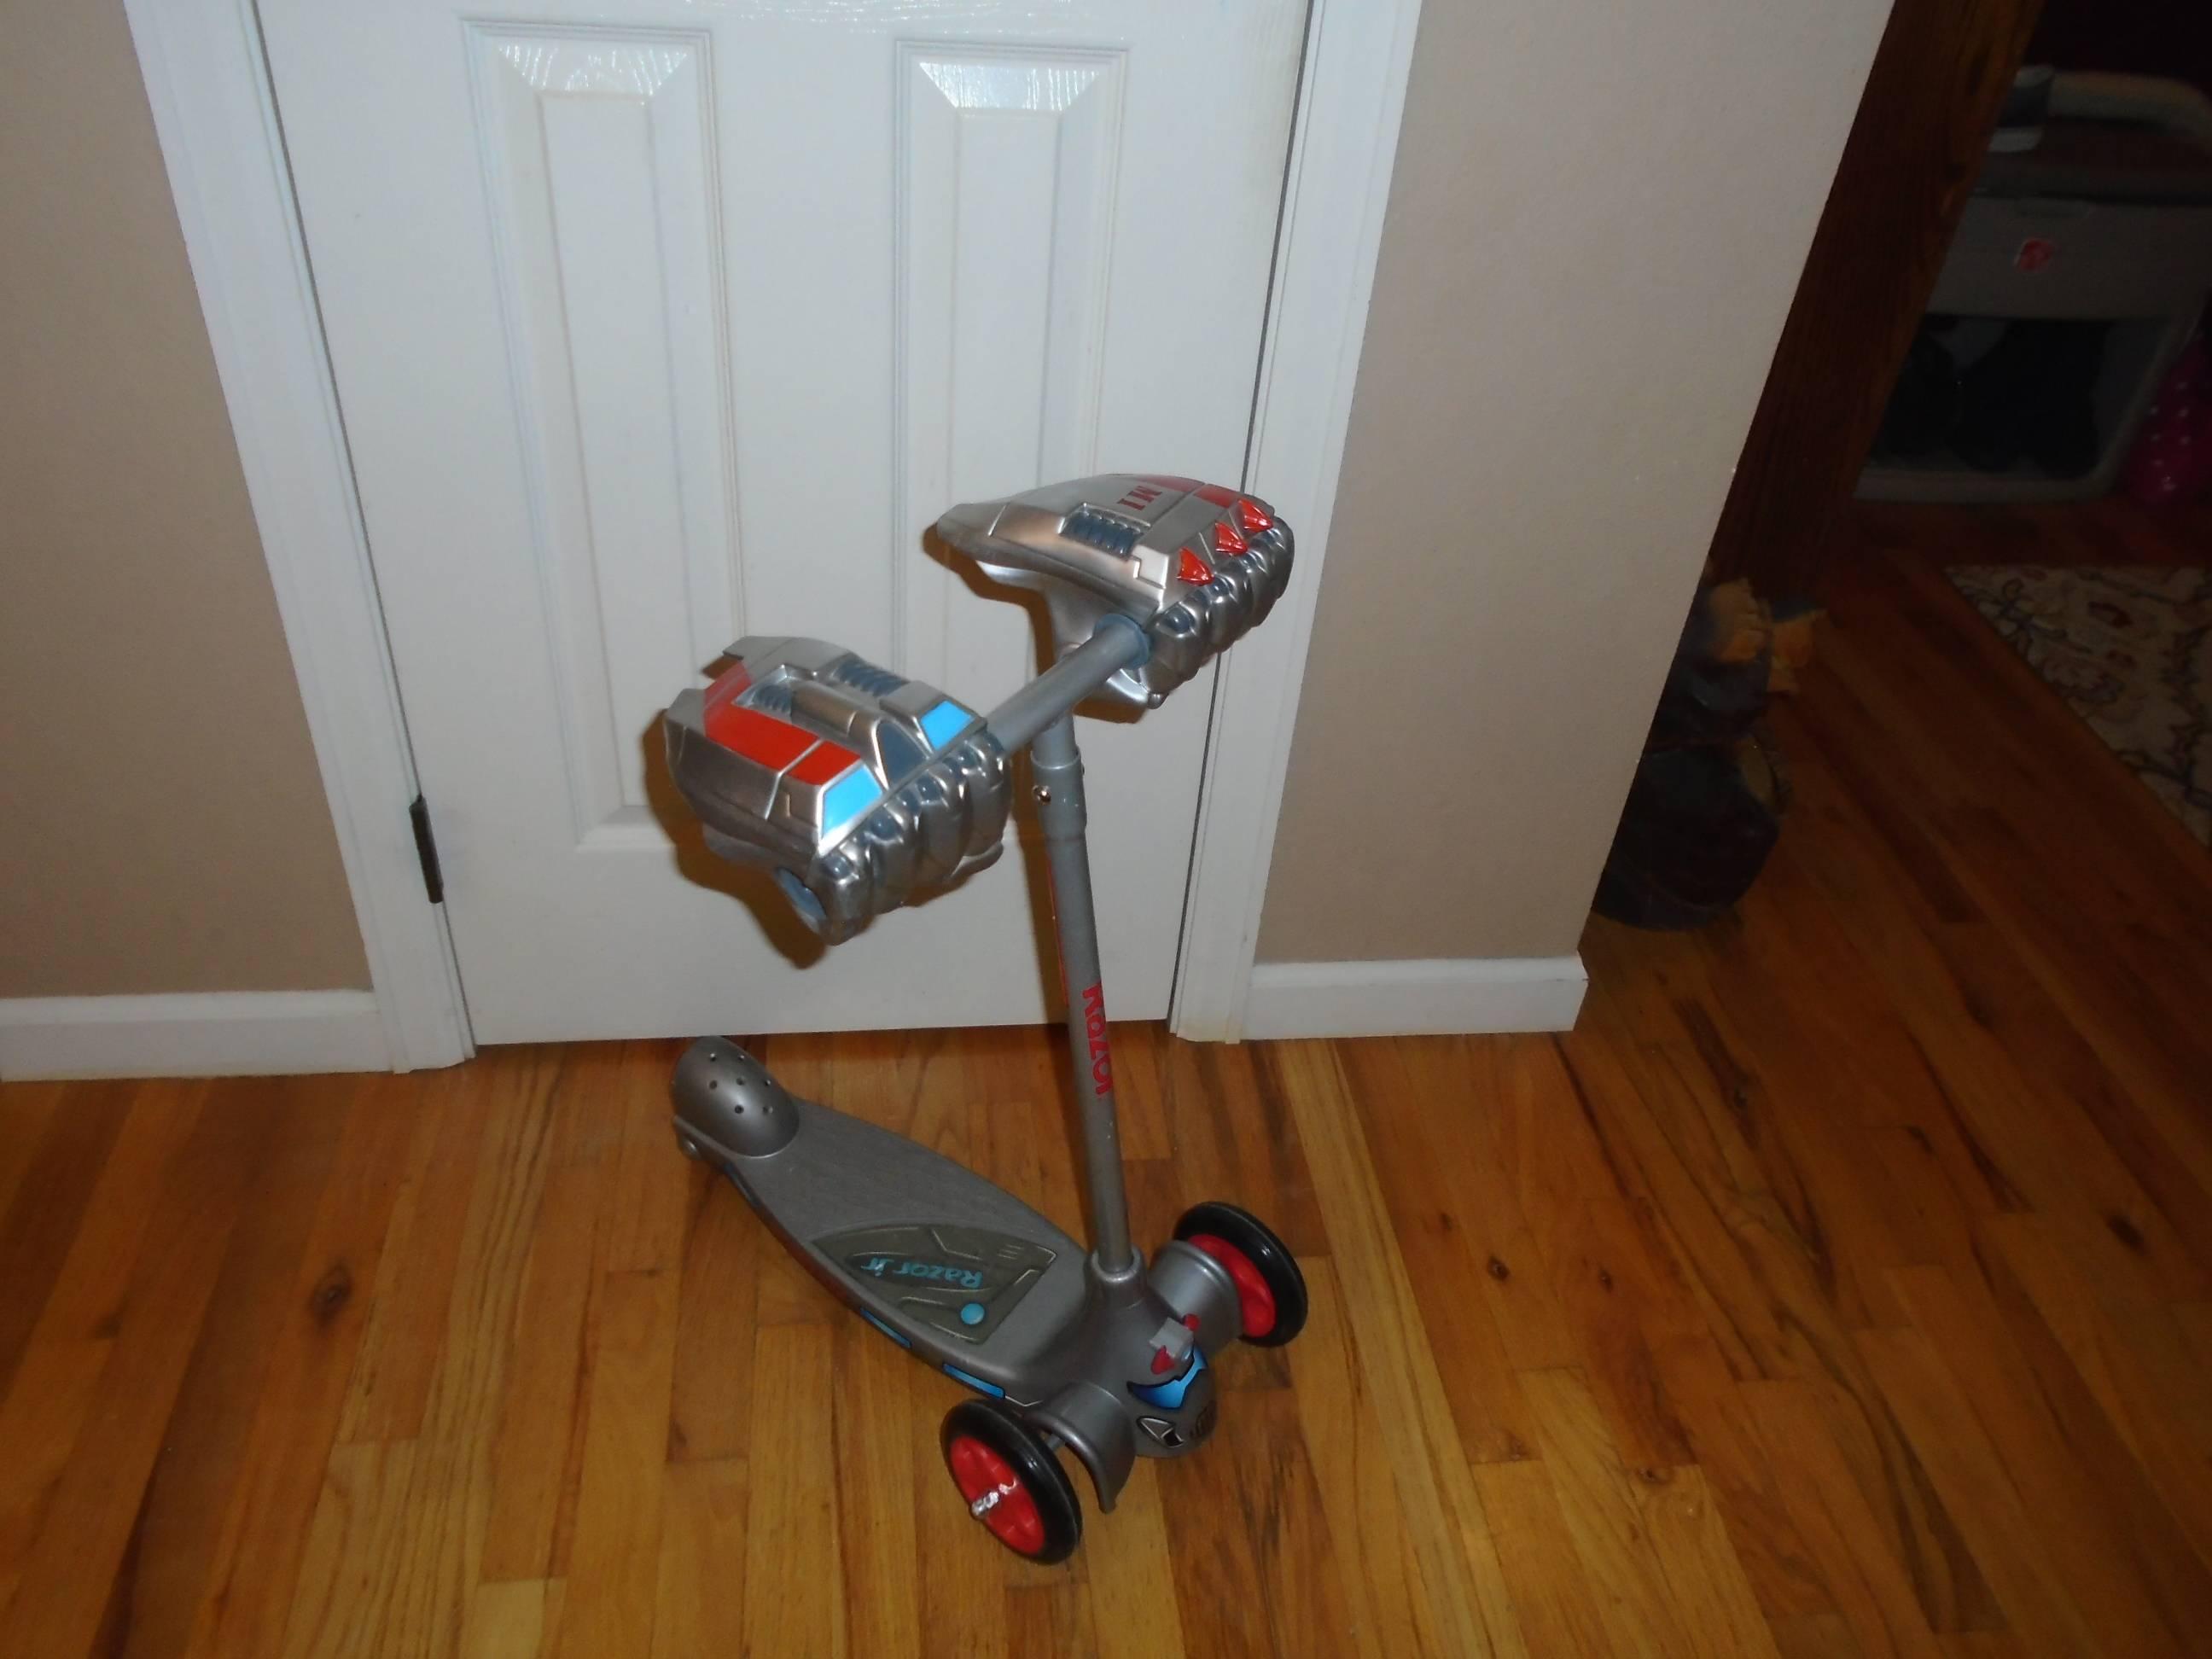 Razor Jr. T3 3 Wheel Scooter - $20